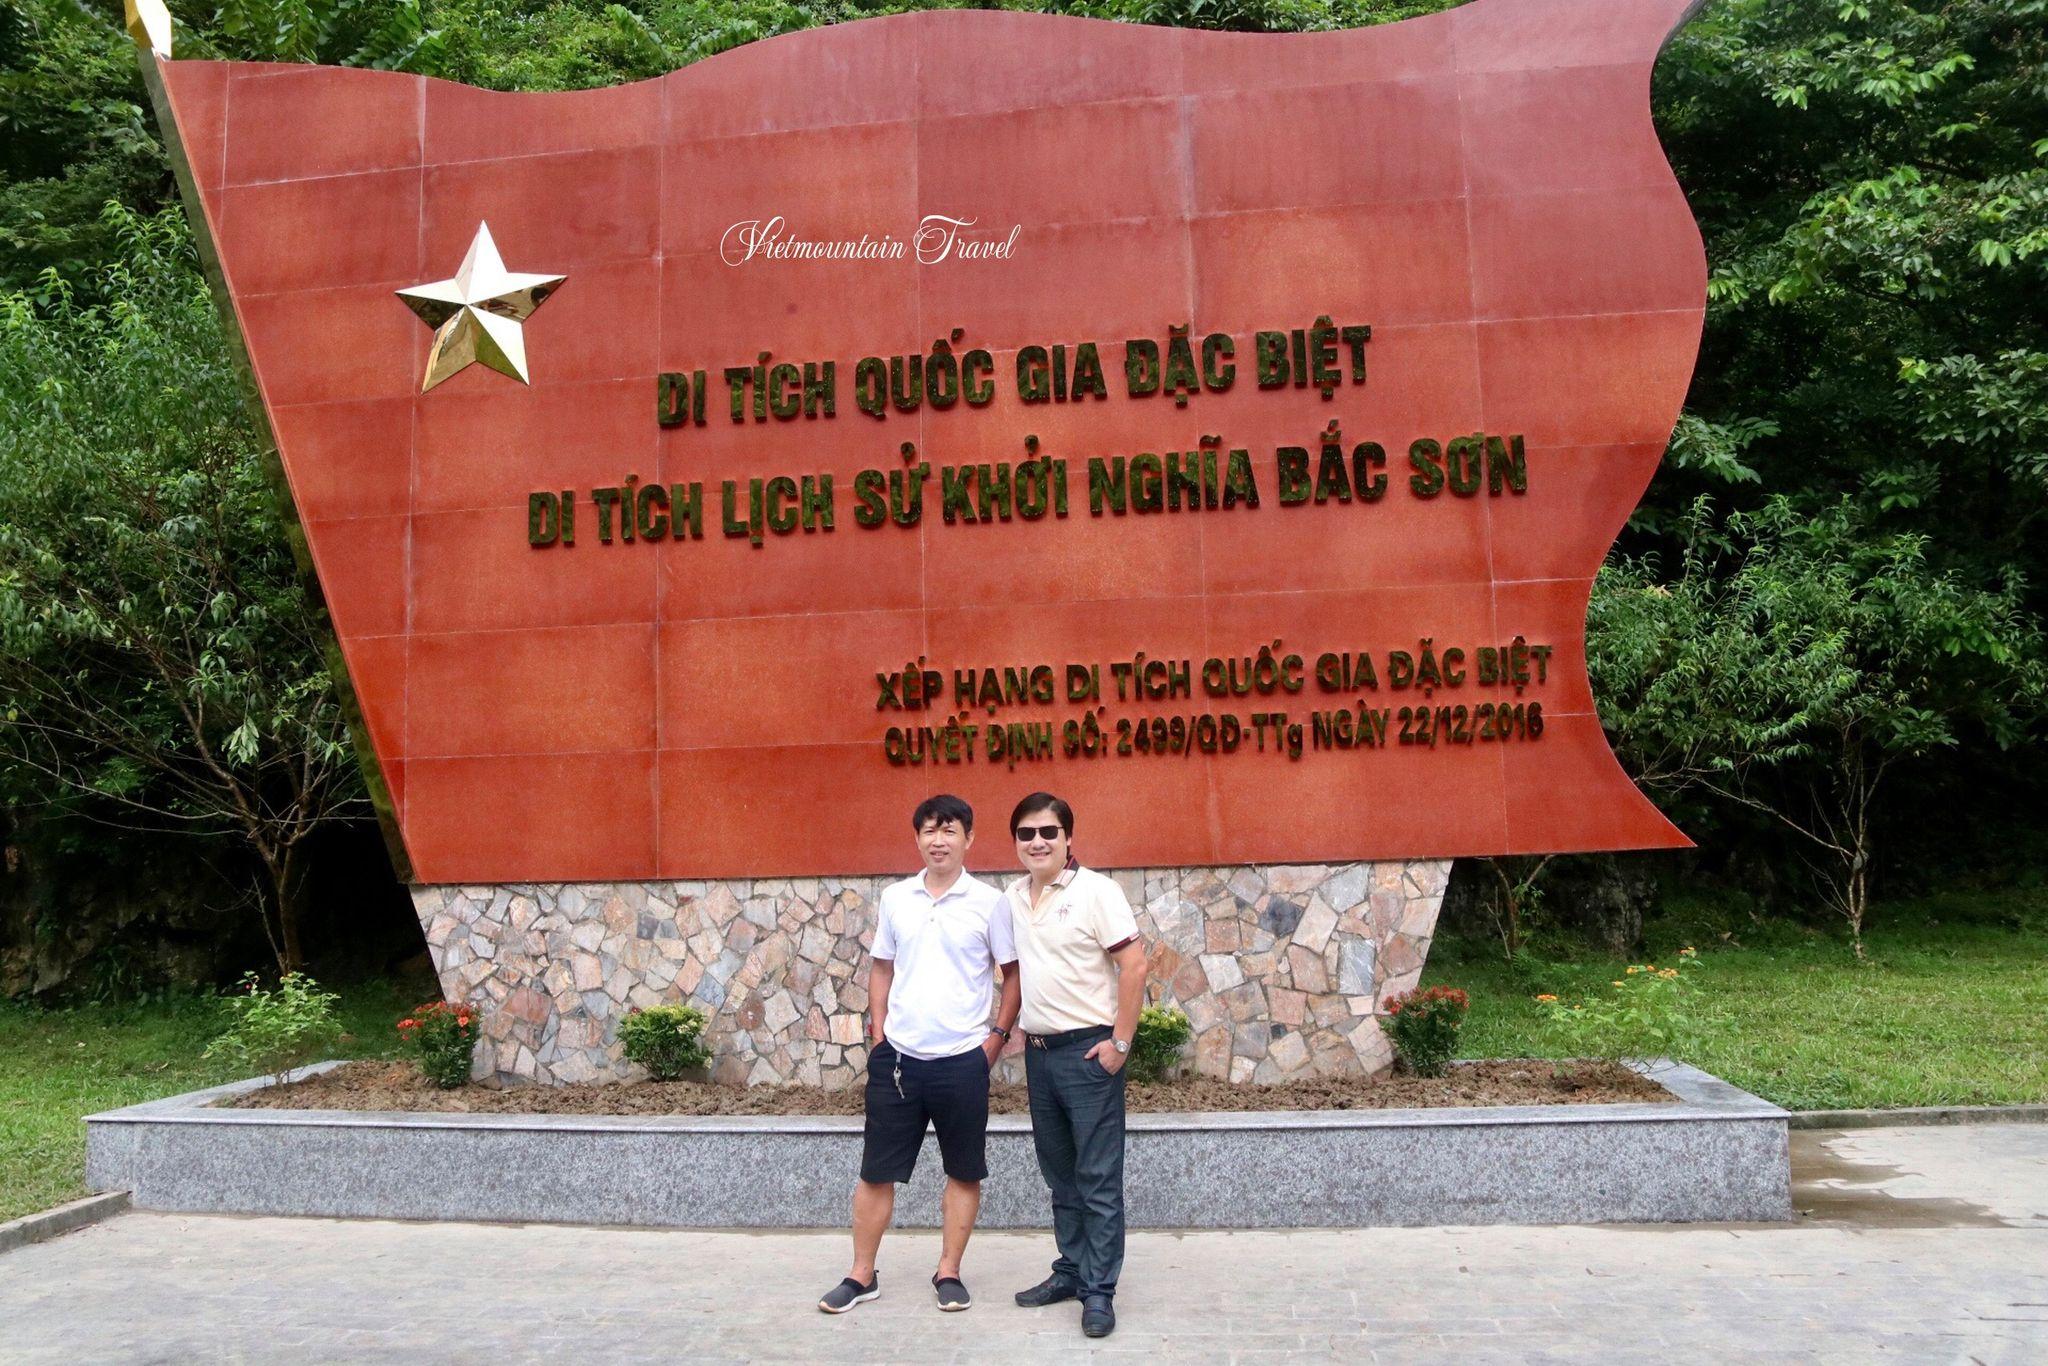 tour-bac-son-trecking-na-lay-mua-lua-chin-2-ngay-1-dem-du-lich-nui-viet-vietmountain-travel21